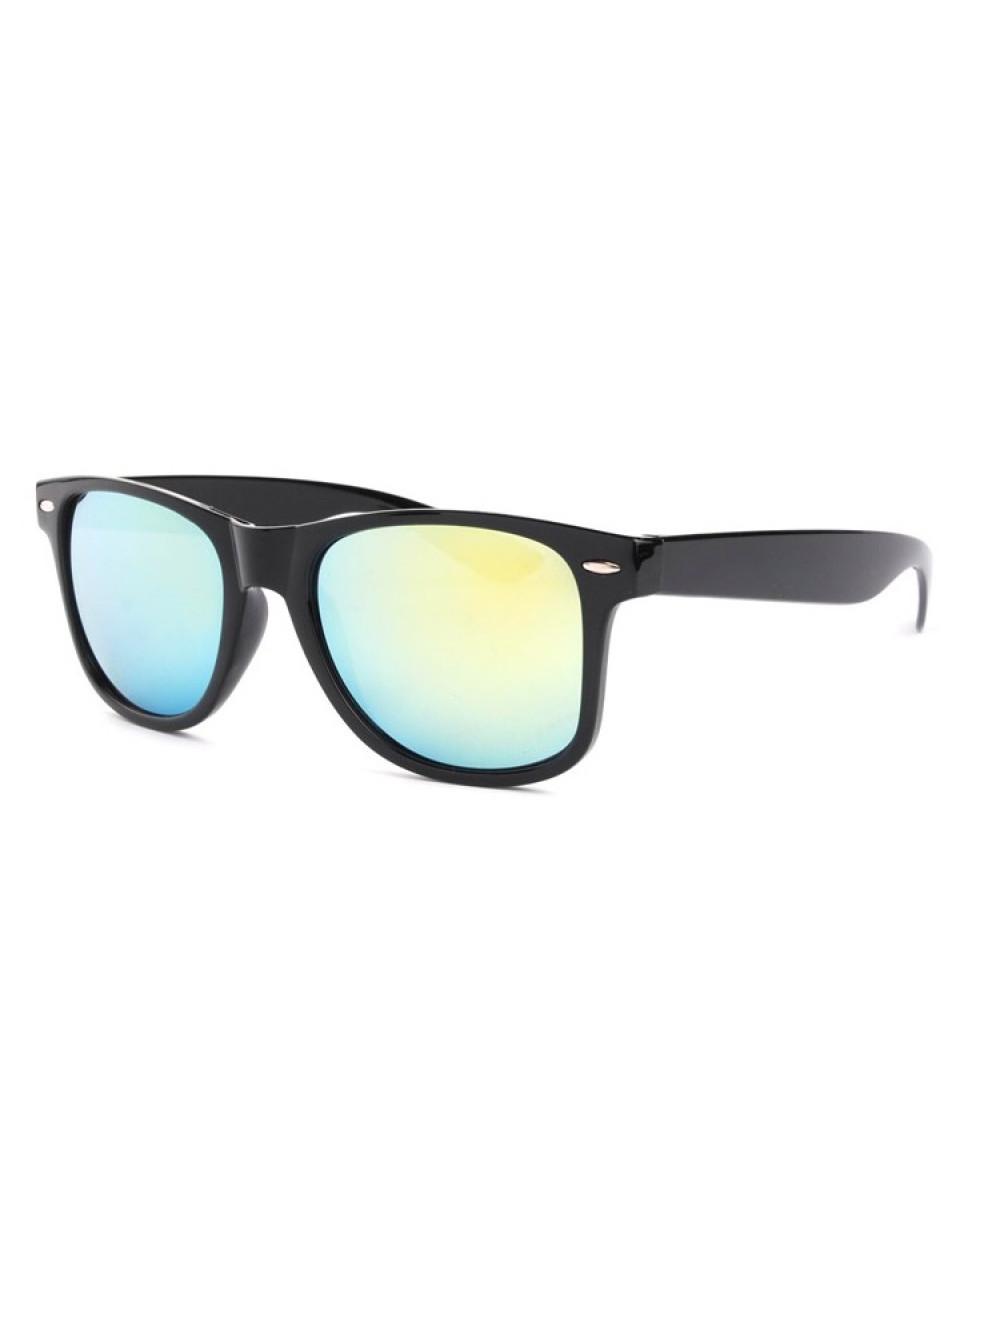 Slnečné okuliare Wayfarer Classic Green